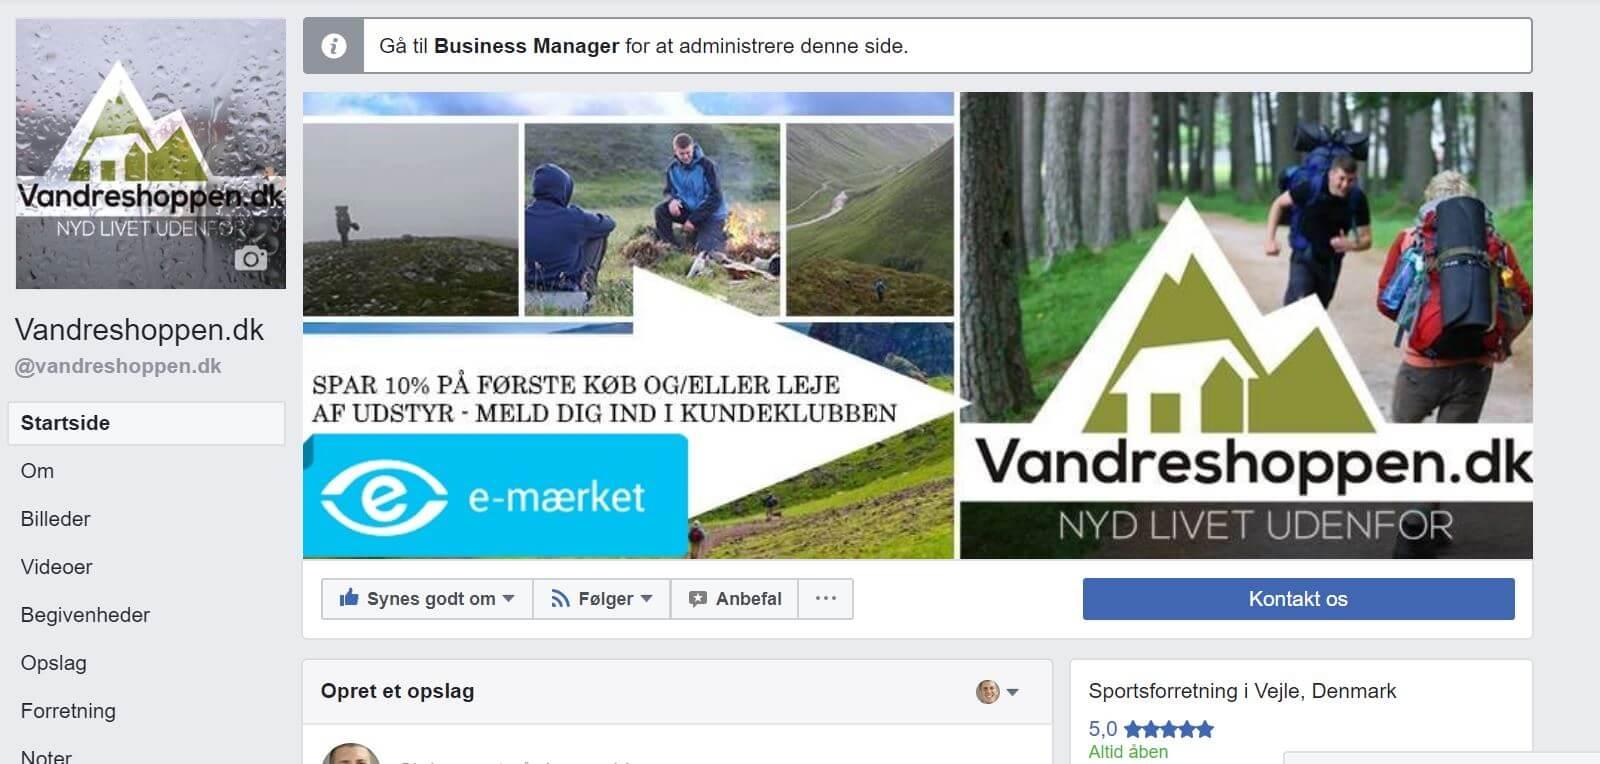 Vandreshoppen.dk Facebook